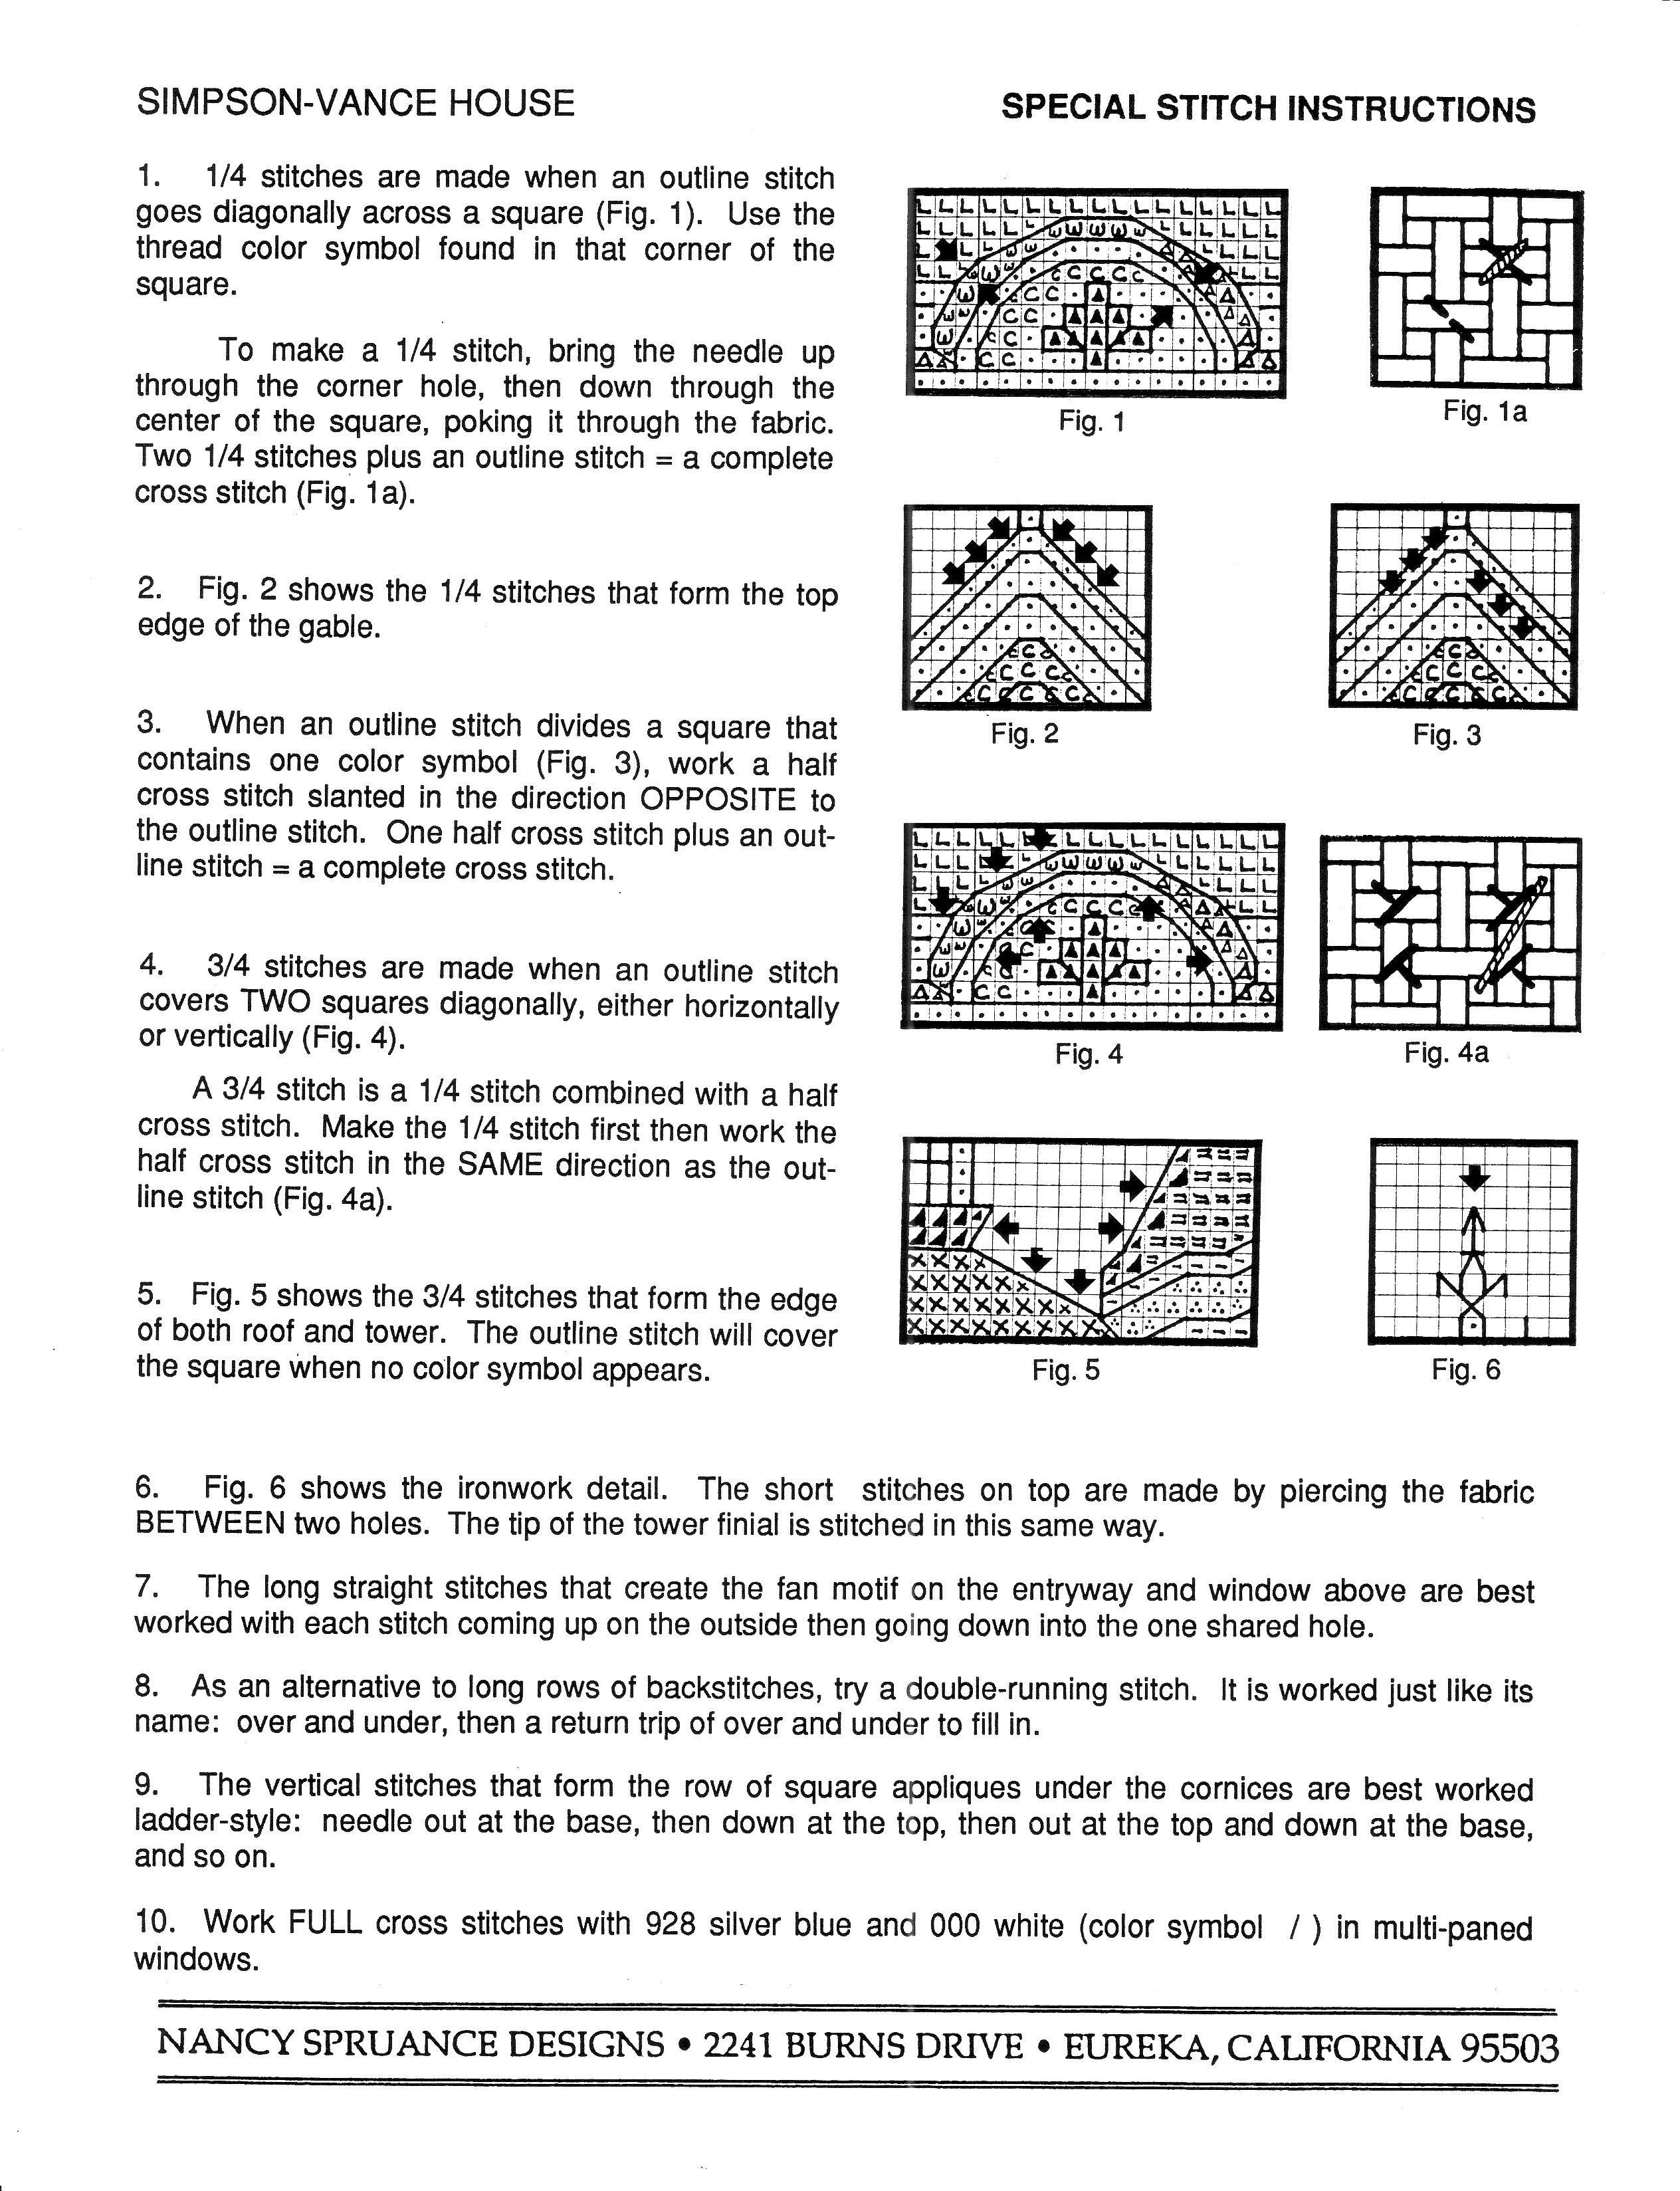 Under square symbol images symbol and sign ideas schema punto croce simpson vance house 08 puntos y ms schema punto croce simpson vance house buycottarizona